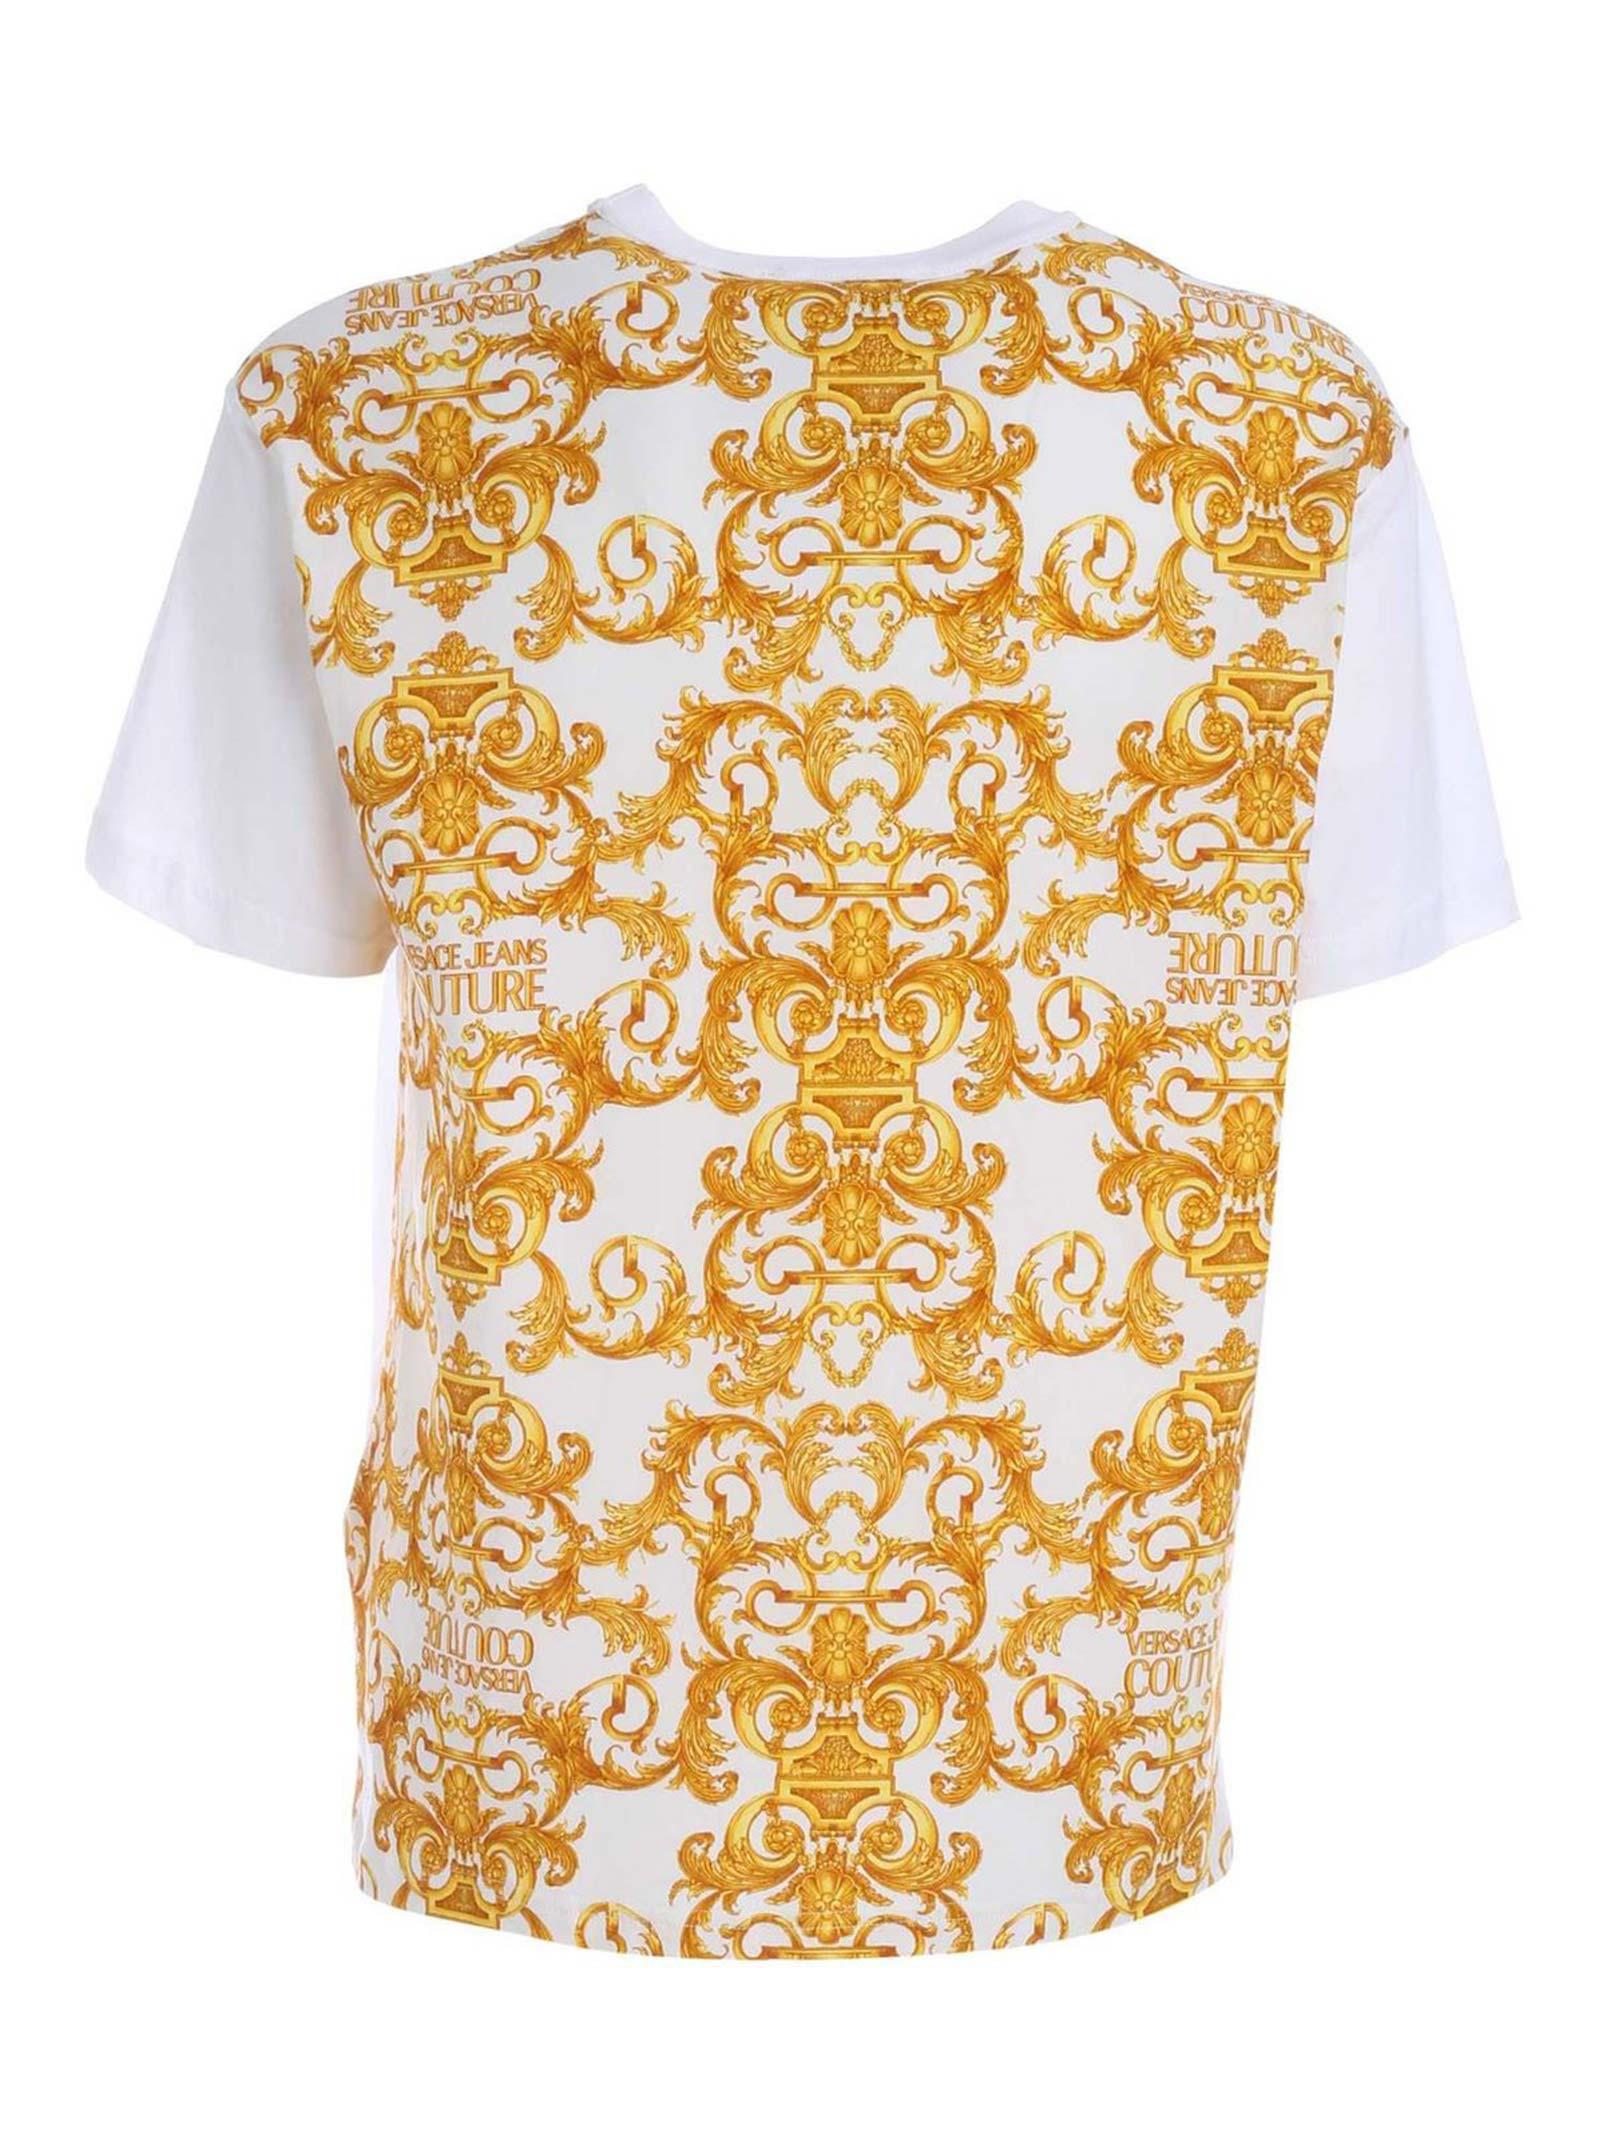 T-shirt Maniche Corte VERSACE JEANS | T-shirt | B3 GWA7R1S0155 003